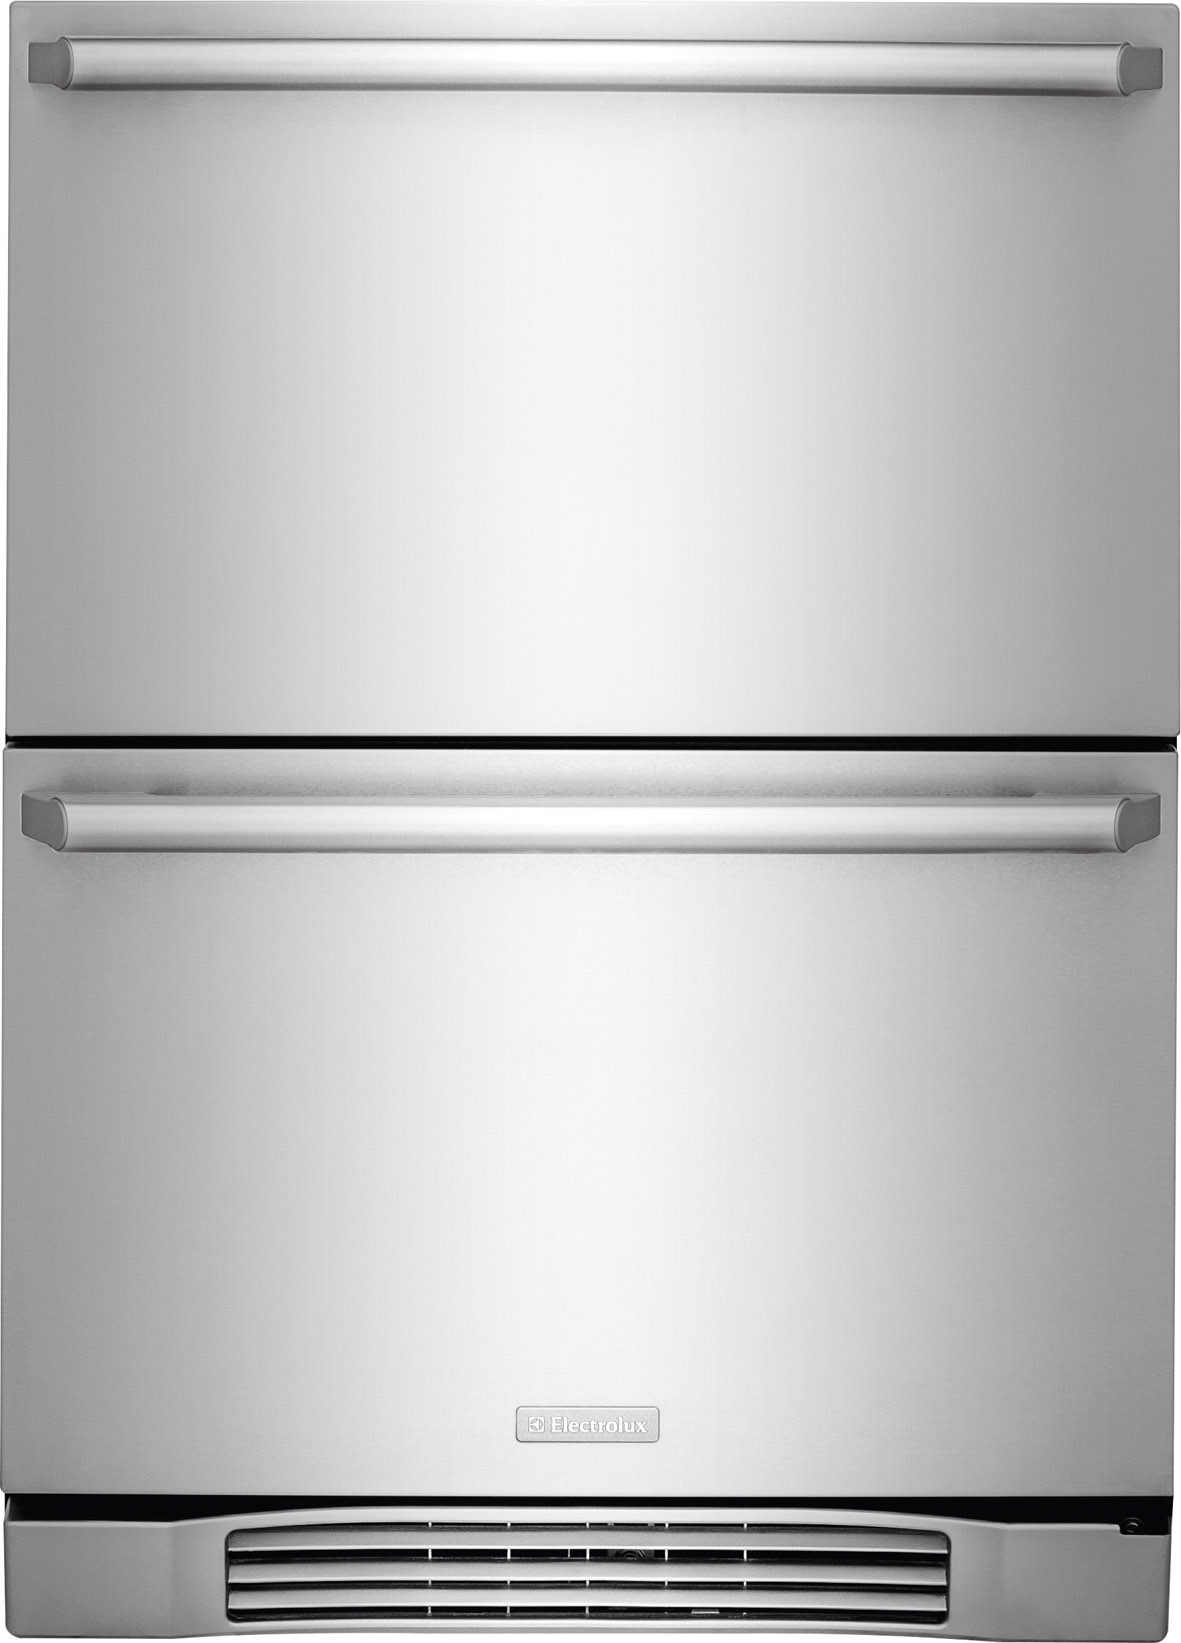 kit european name integrated door monogram refrigerator specs reversible dispatcher swing single panel solid image requesttype for us customizable drawer